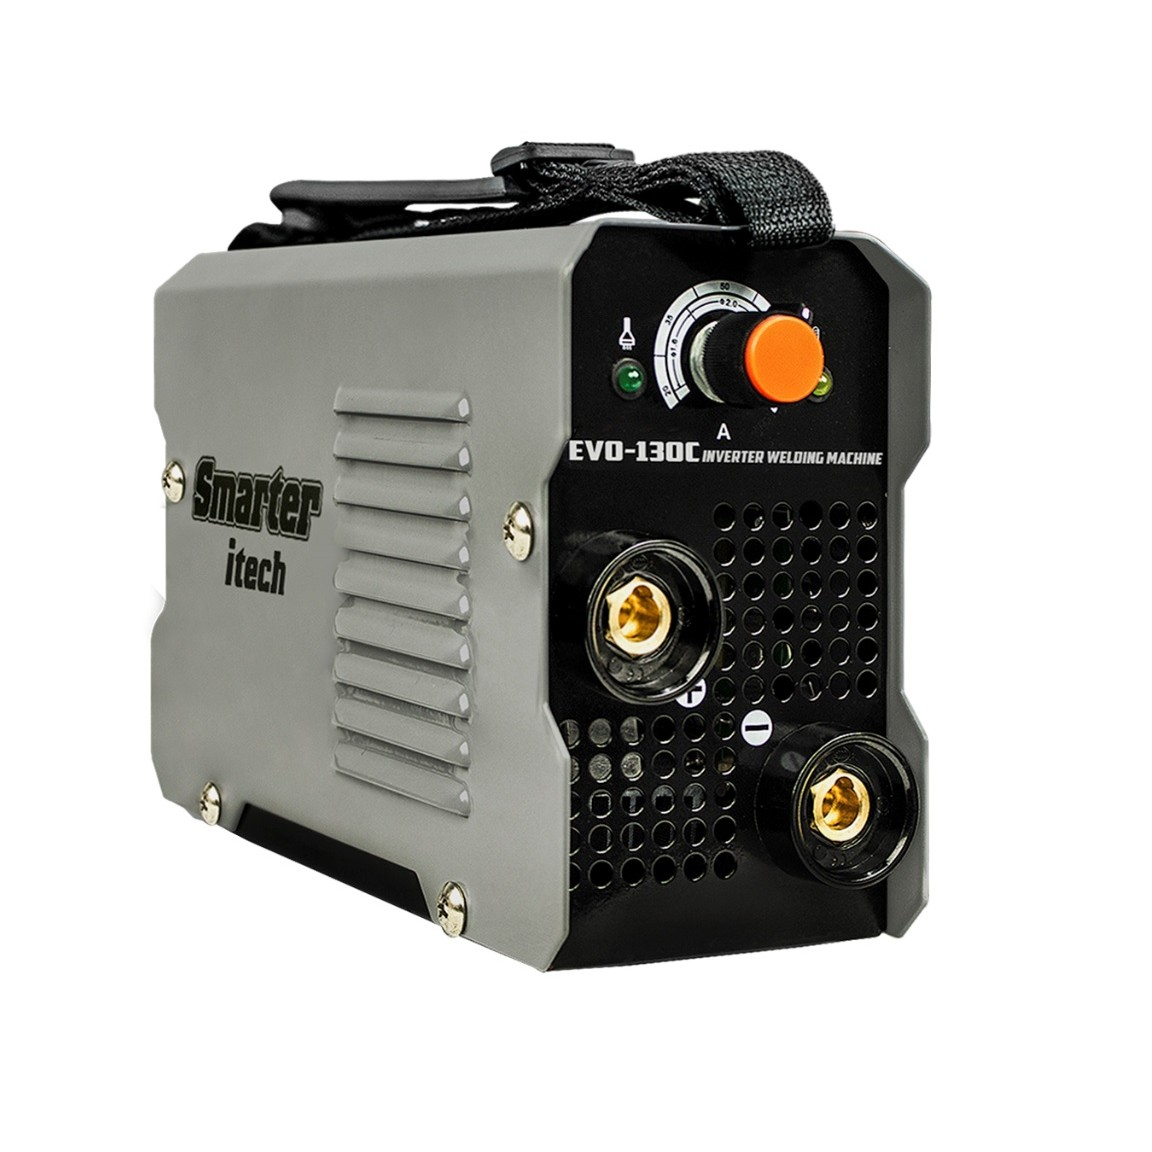 Maquina de Solda Inversora 130A 220V EVO-130C - Smarter